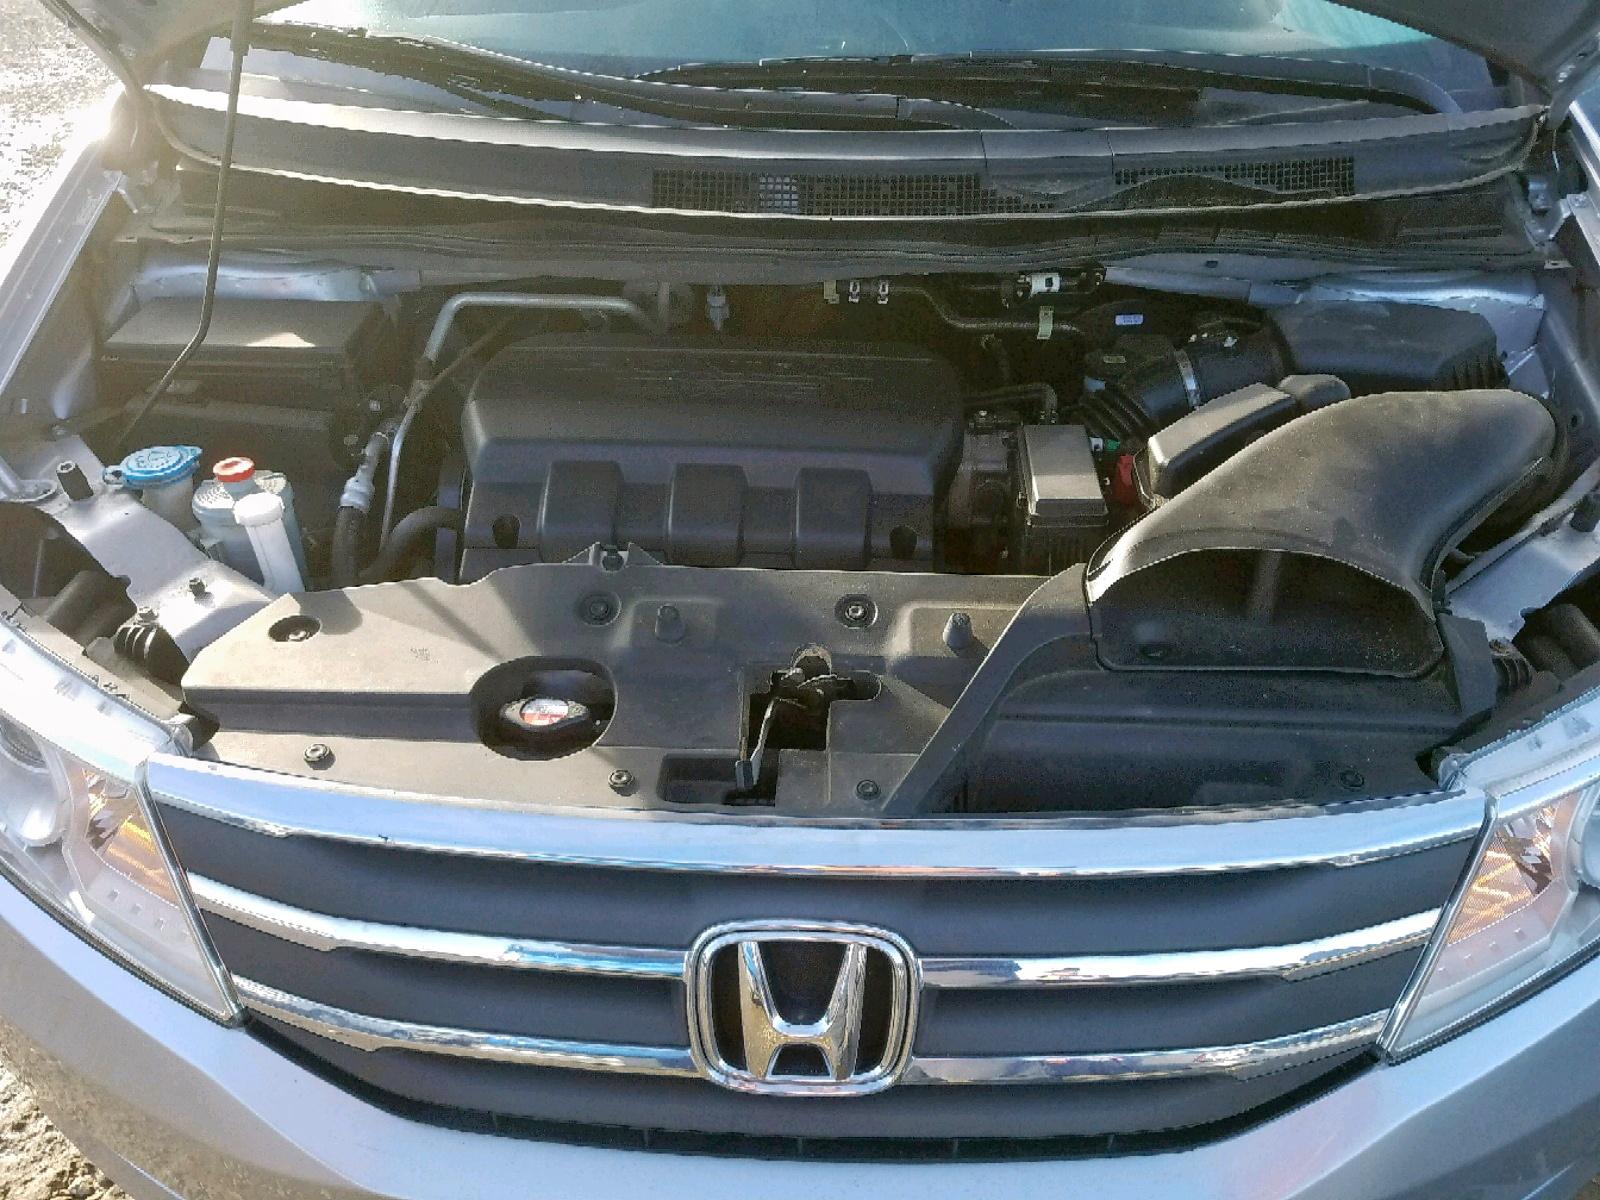 2013 Honda Odyssey To 3.5L inside view